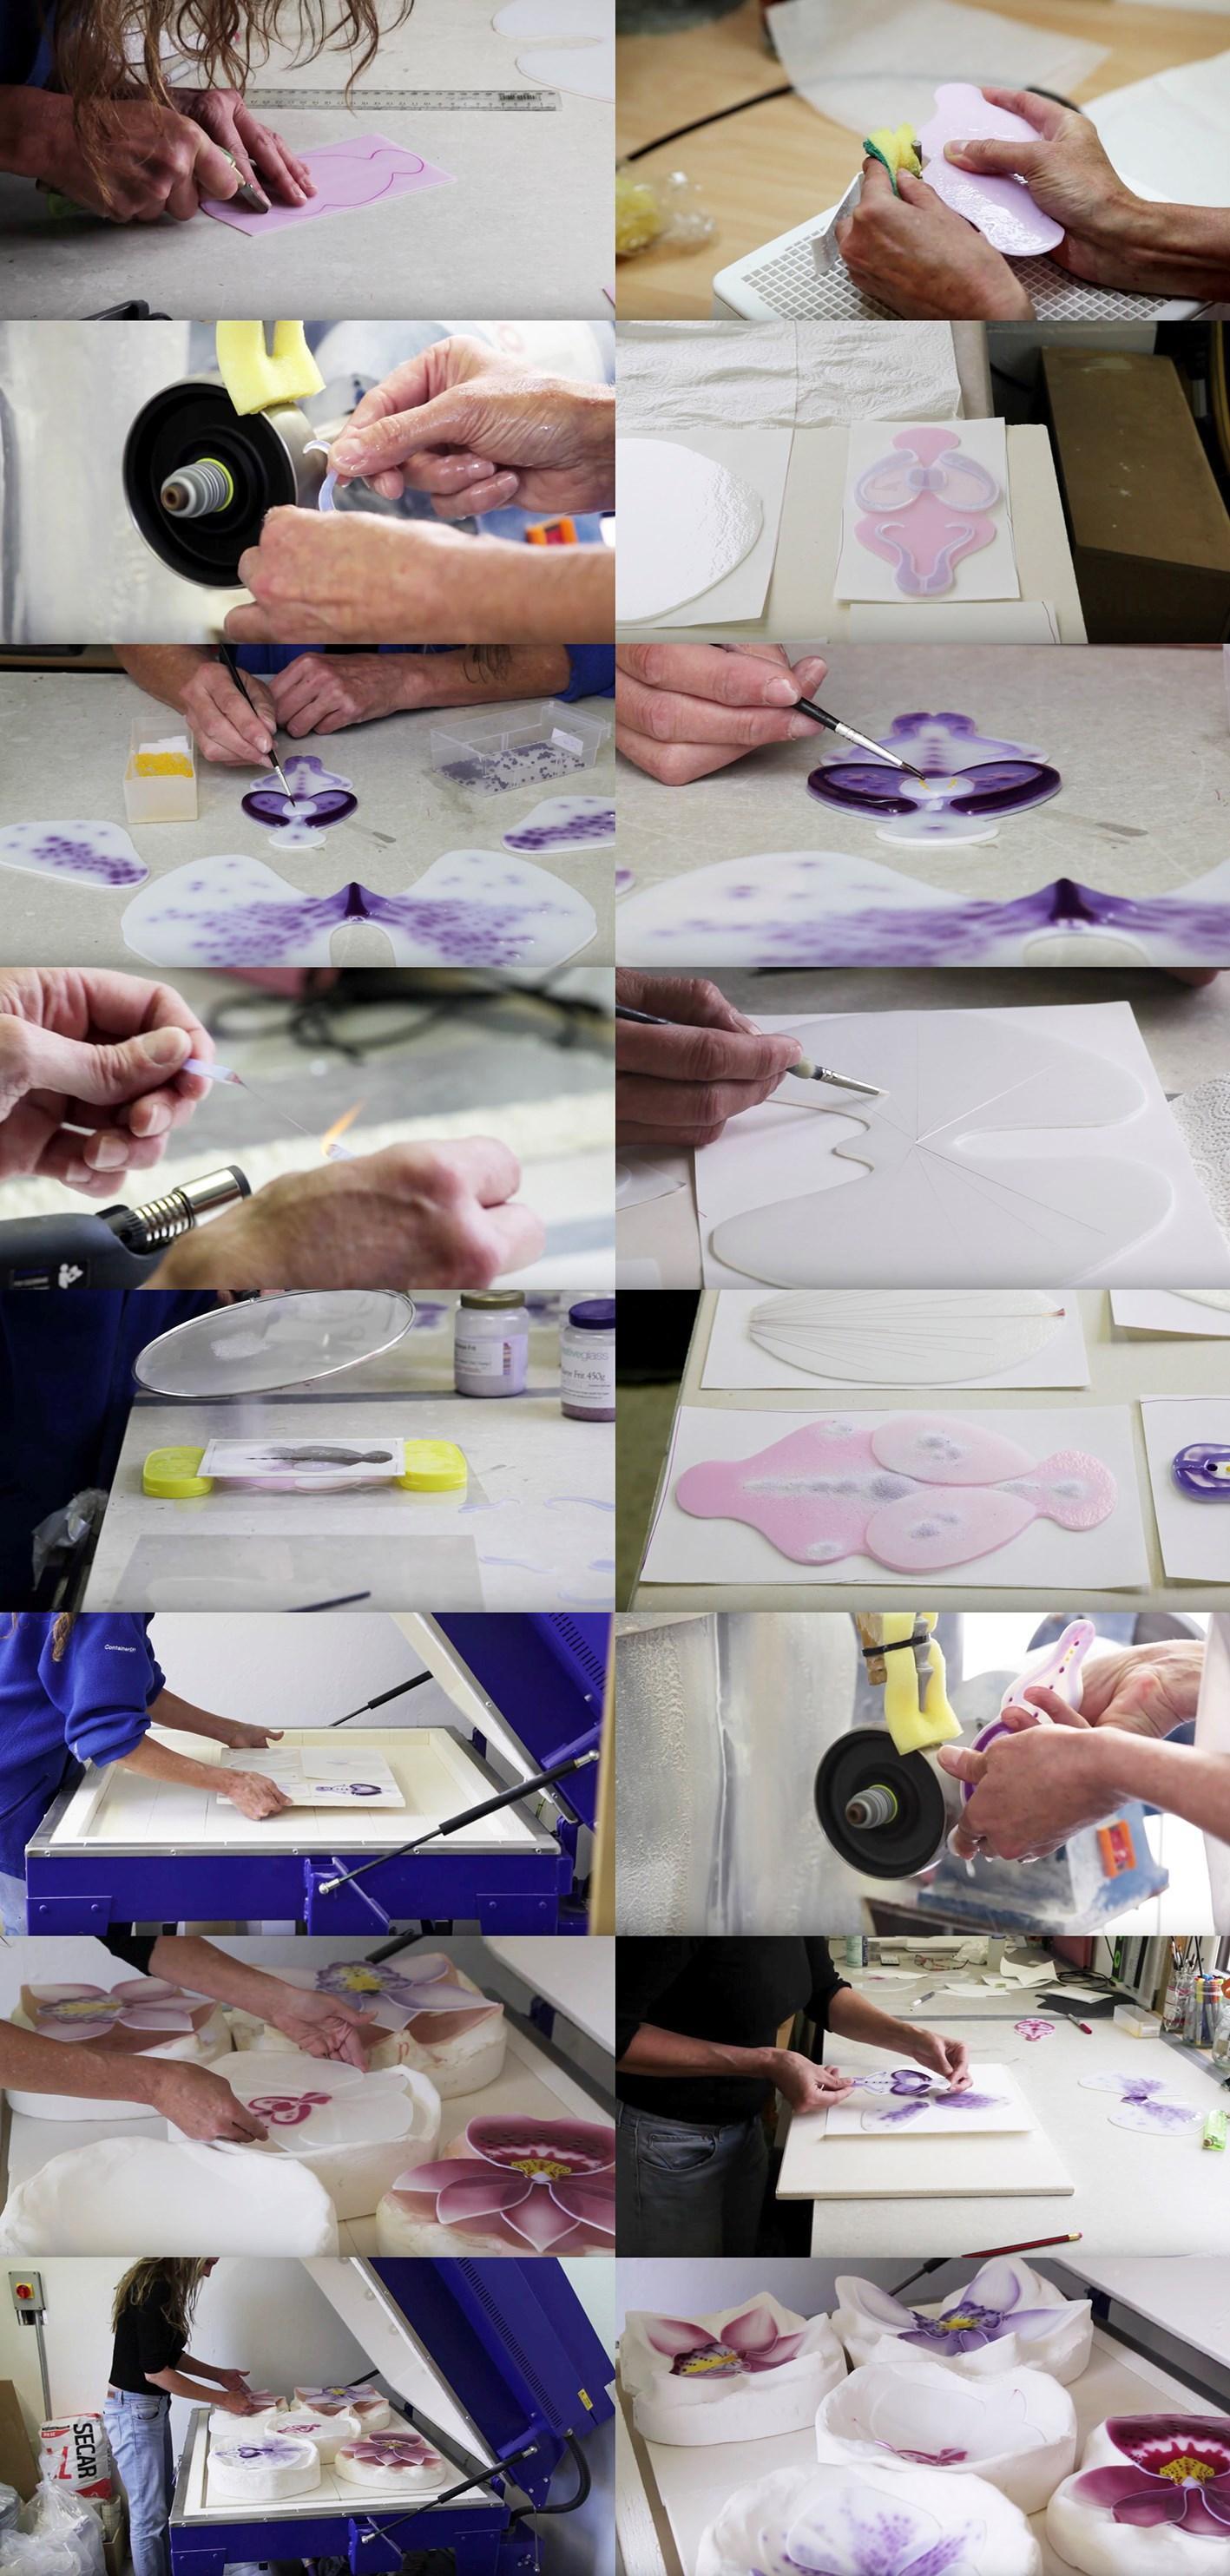 architectural glass art artist laura hart at work in studio